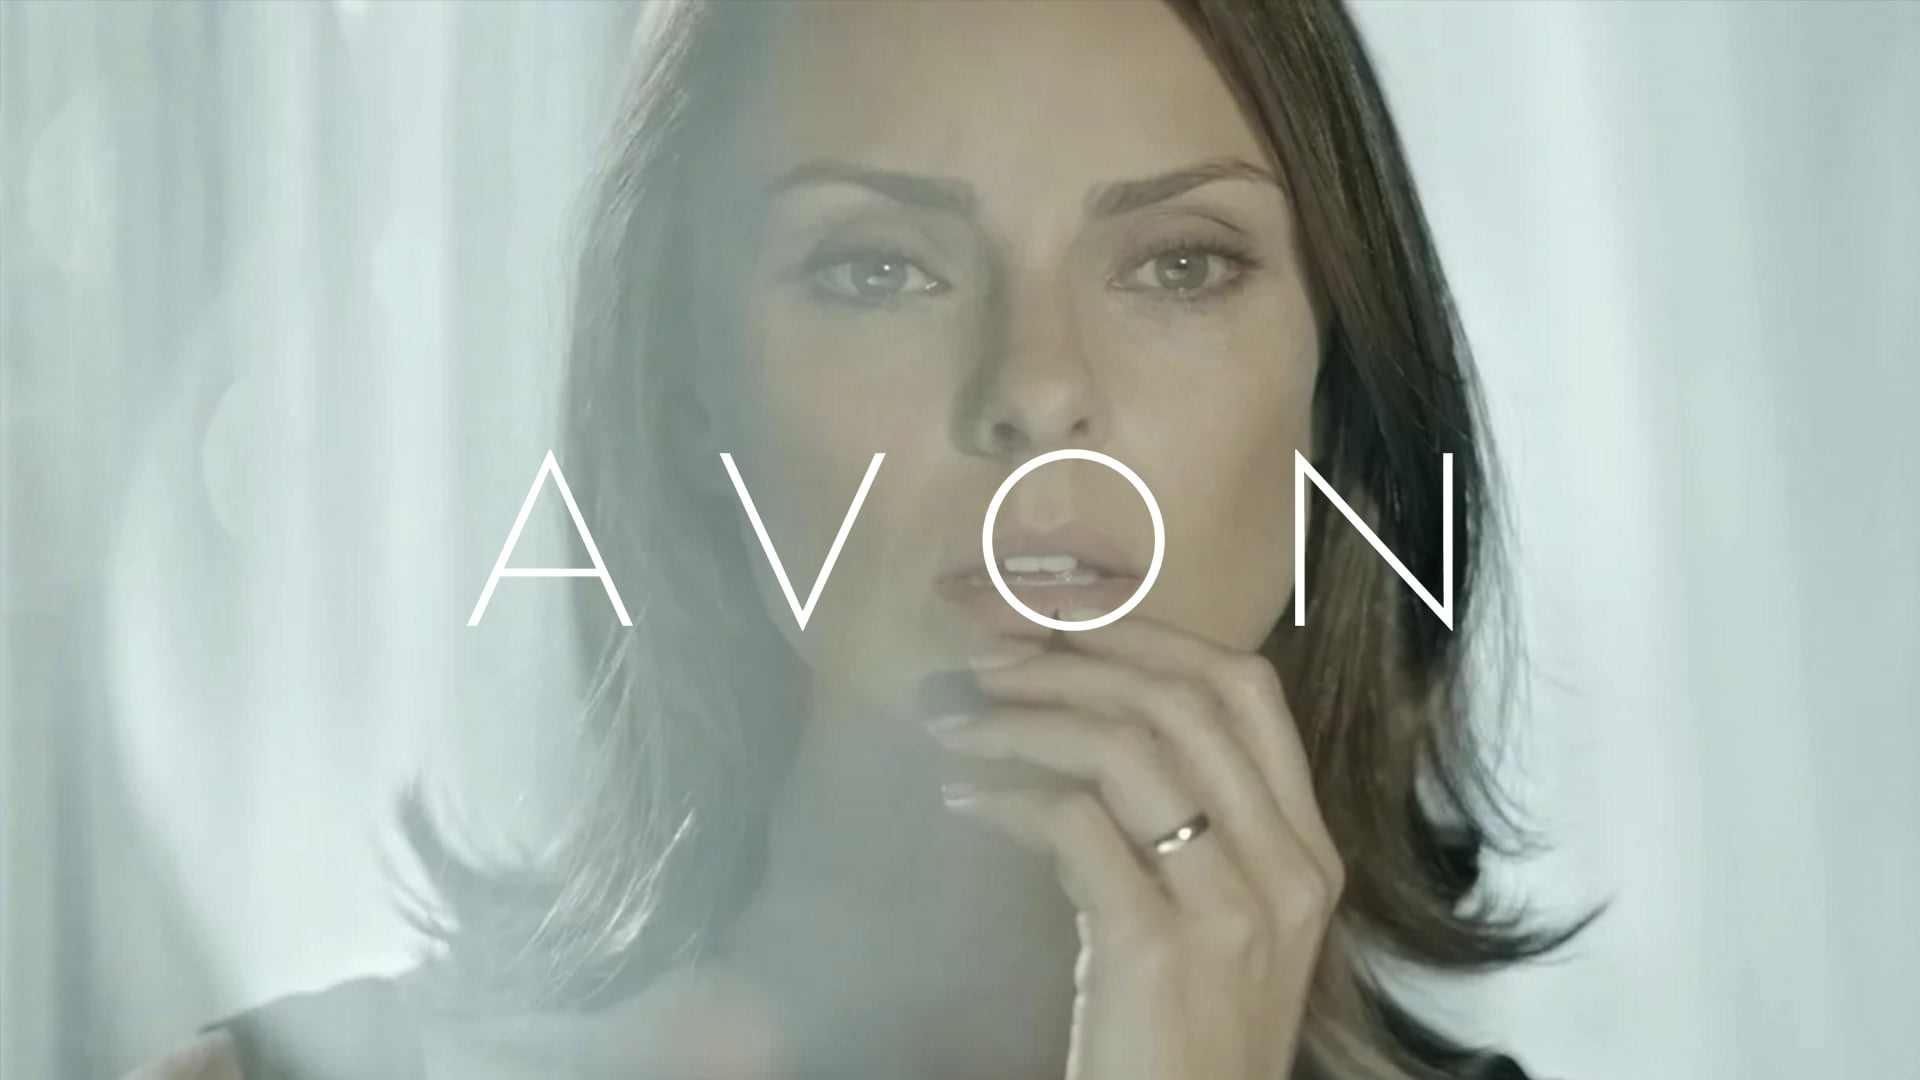 Linha 180 - Avon  (Director's Cut)